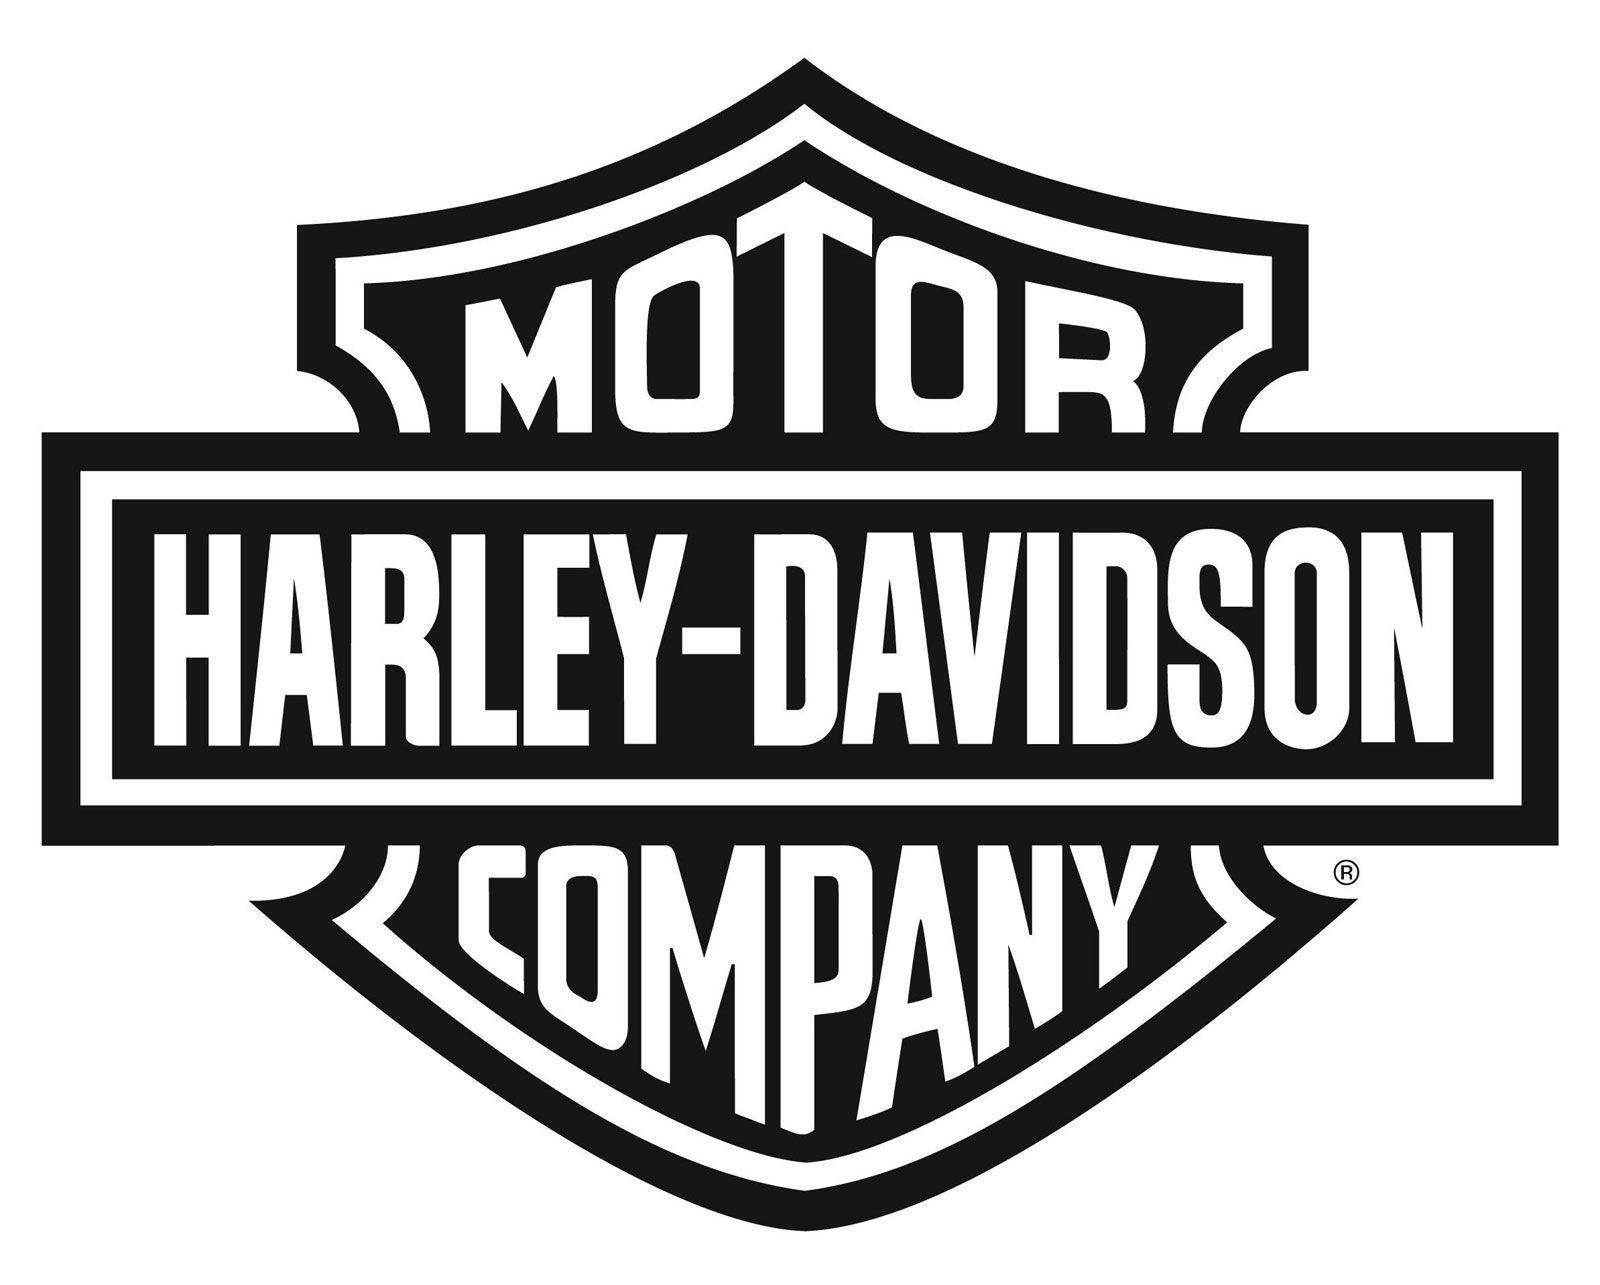 Harley Logo Black And White Vector Harley Davidson Pinterest - Stickers for motorcycles harley davidsons